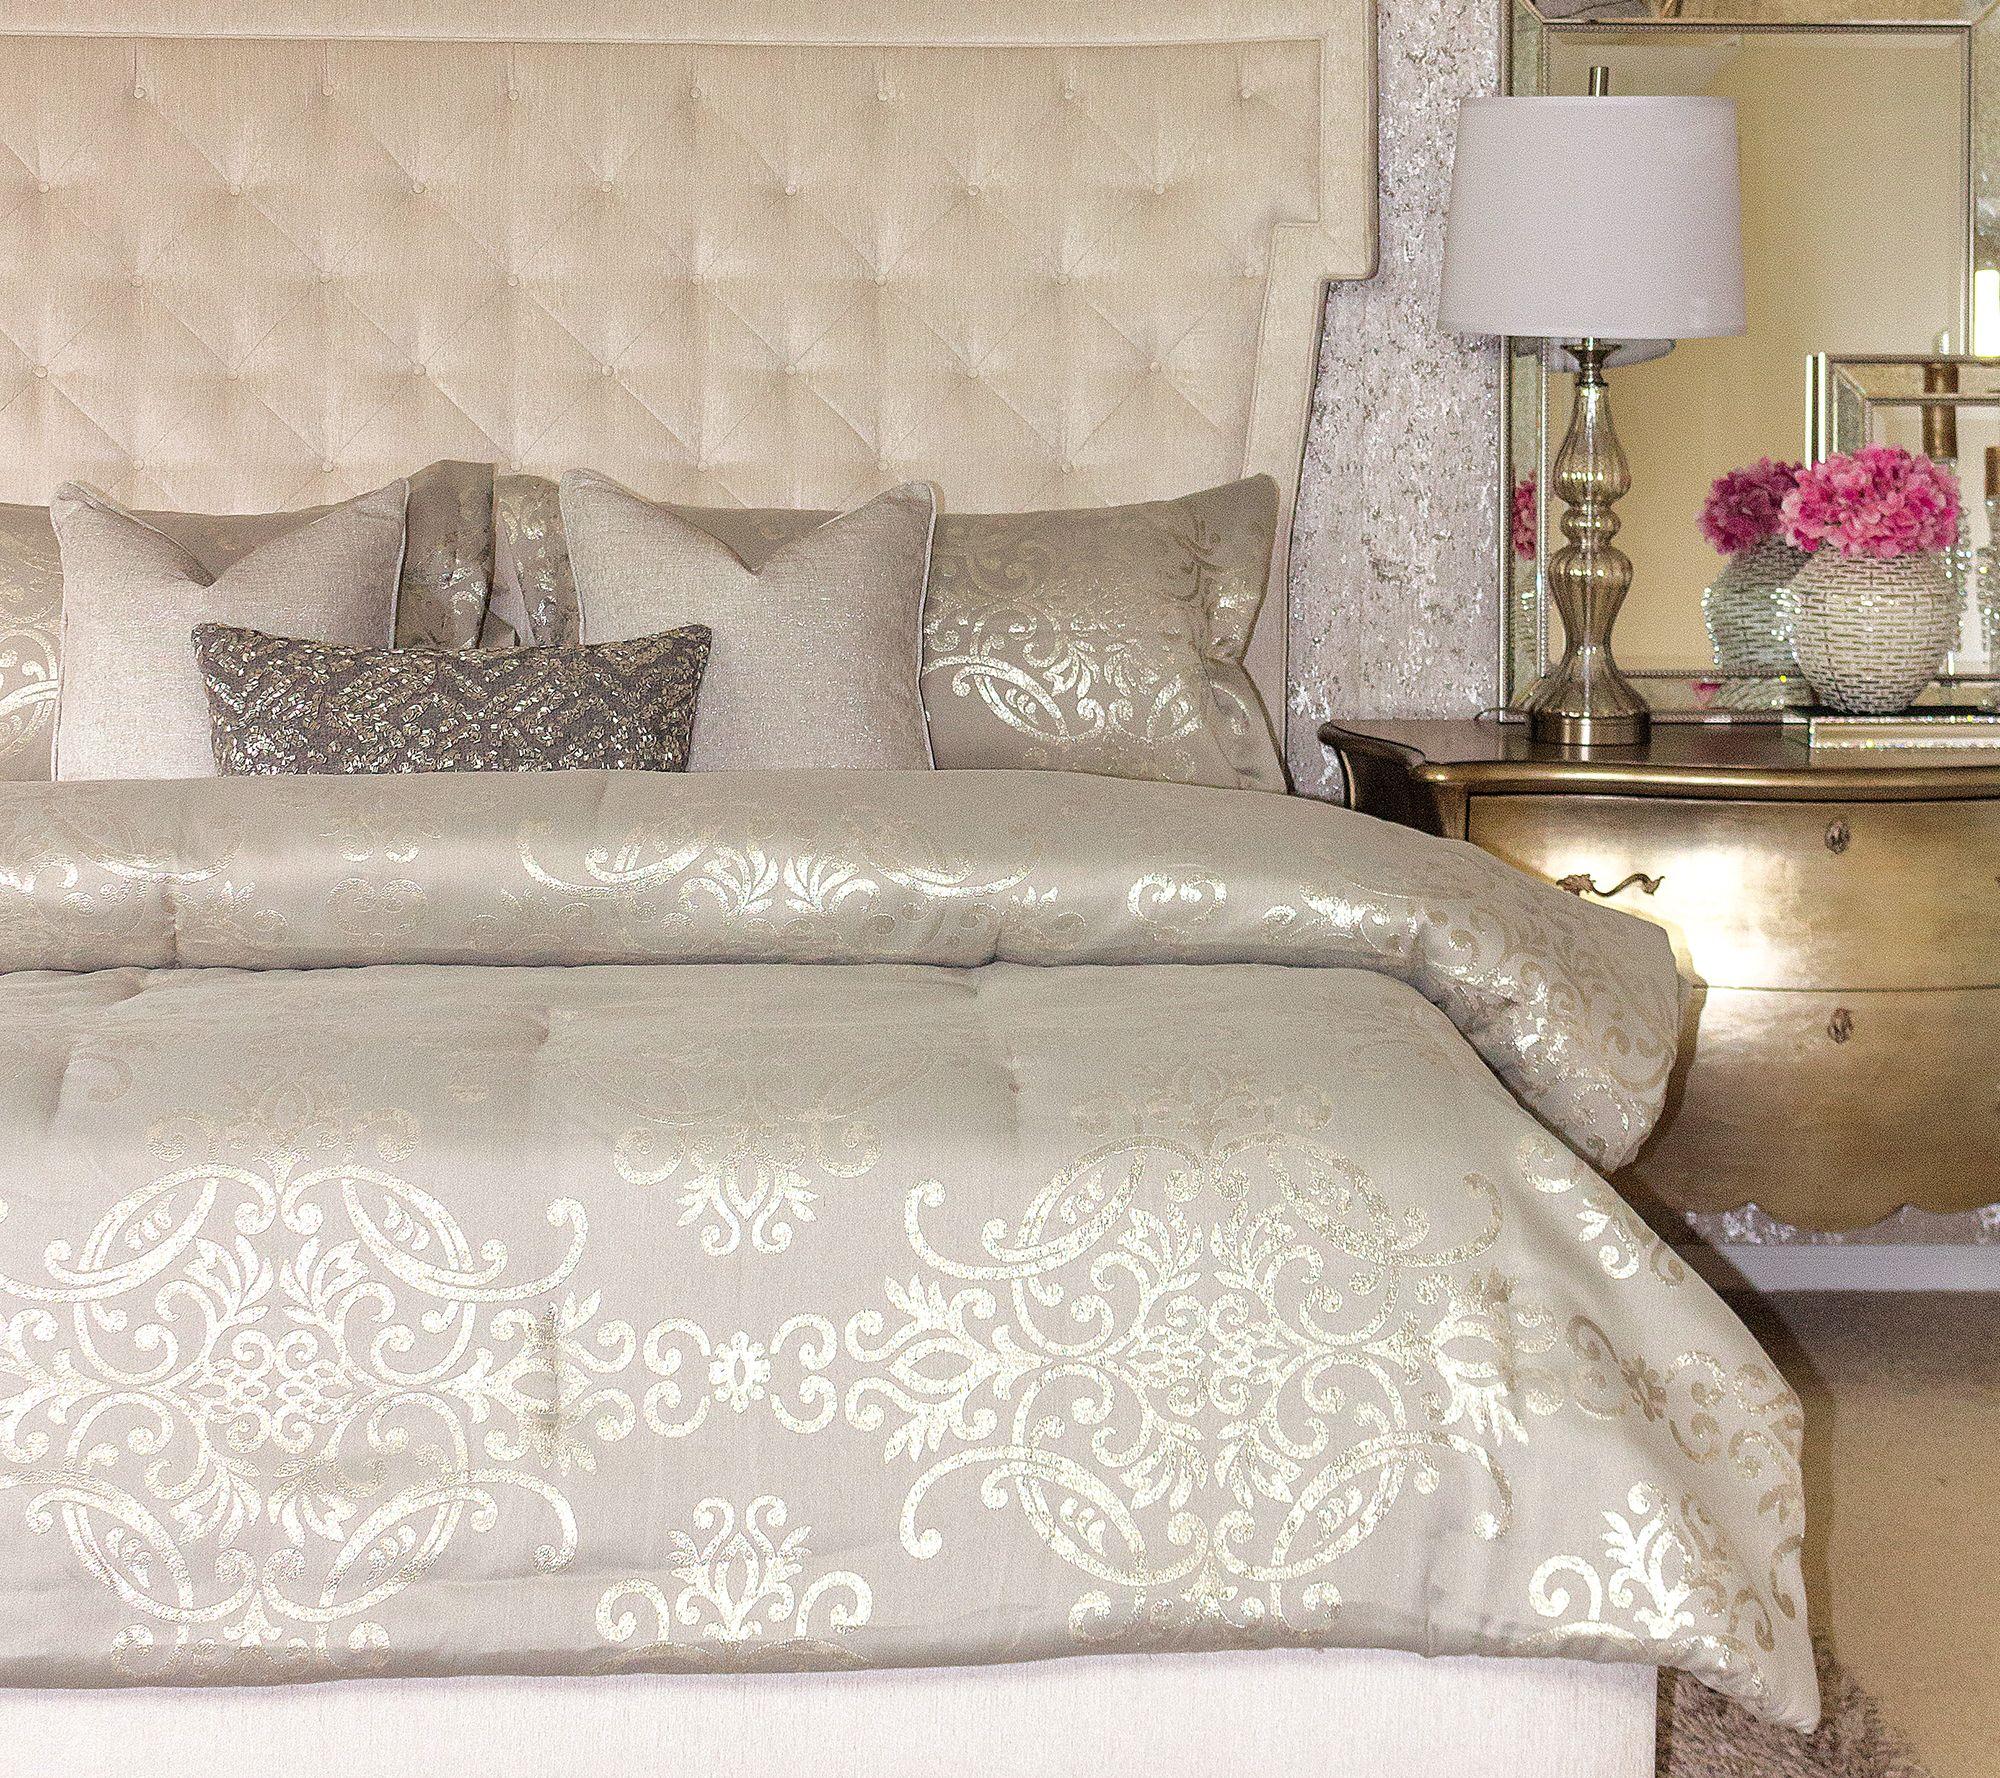 Home Decor 6 Piece Full Comforter Set